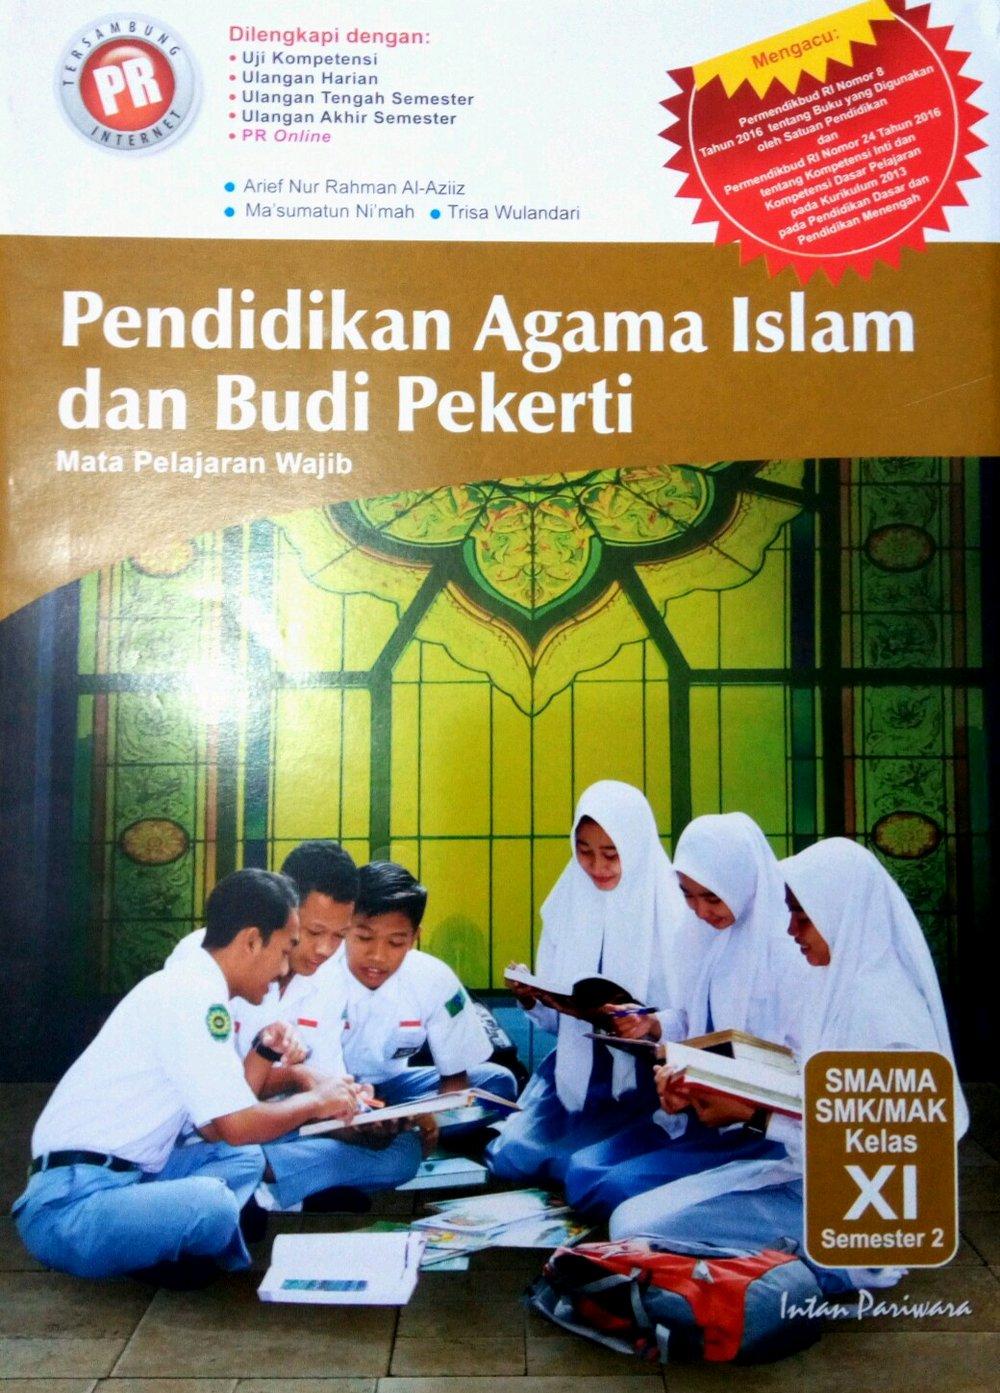 Materi Agama Kelas 11 Semester 2 : materi, agama, kelas, semester, Agama, Islam, Kelas, Semester